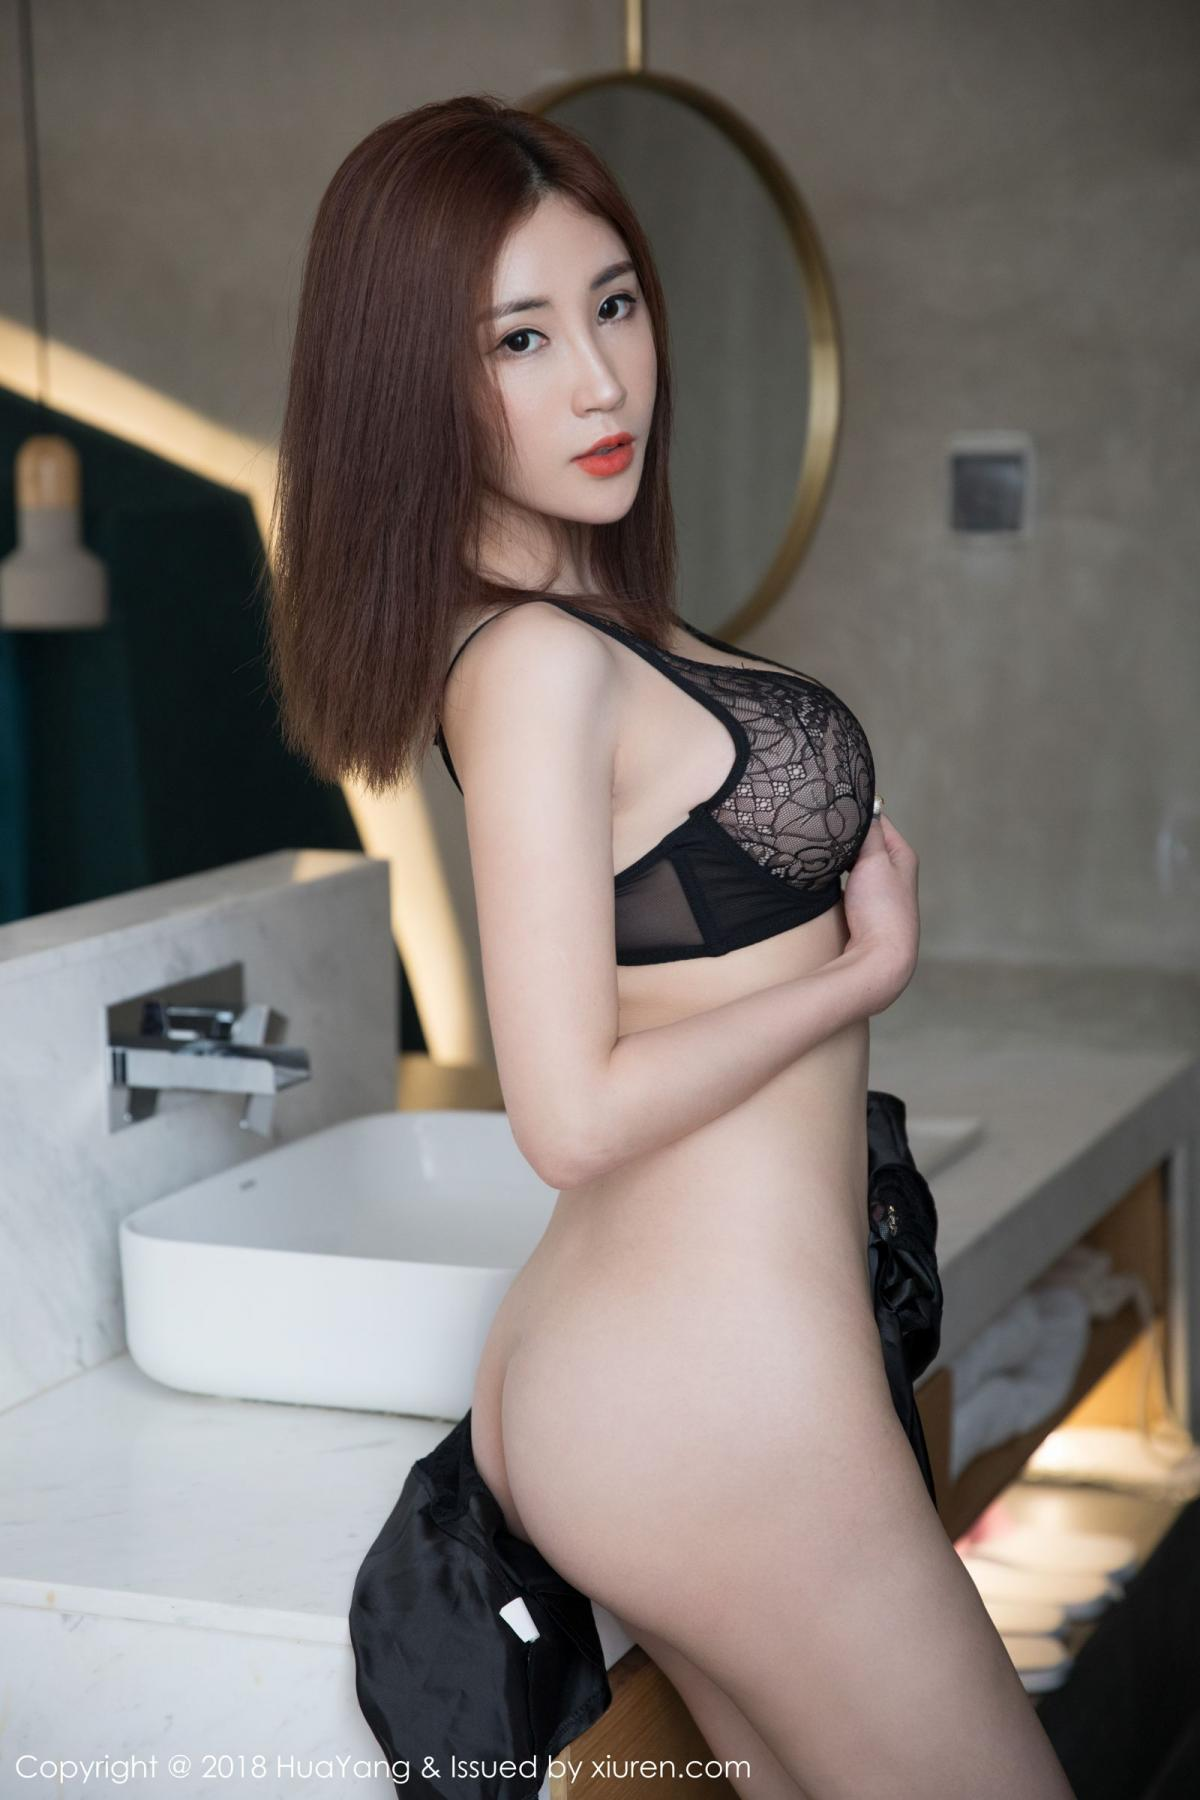 [Huayang] Vol.077 Sun Meng Yao 14P, Adult, Big Booty, HuaYang, Sun Meng Yao, Underwear